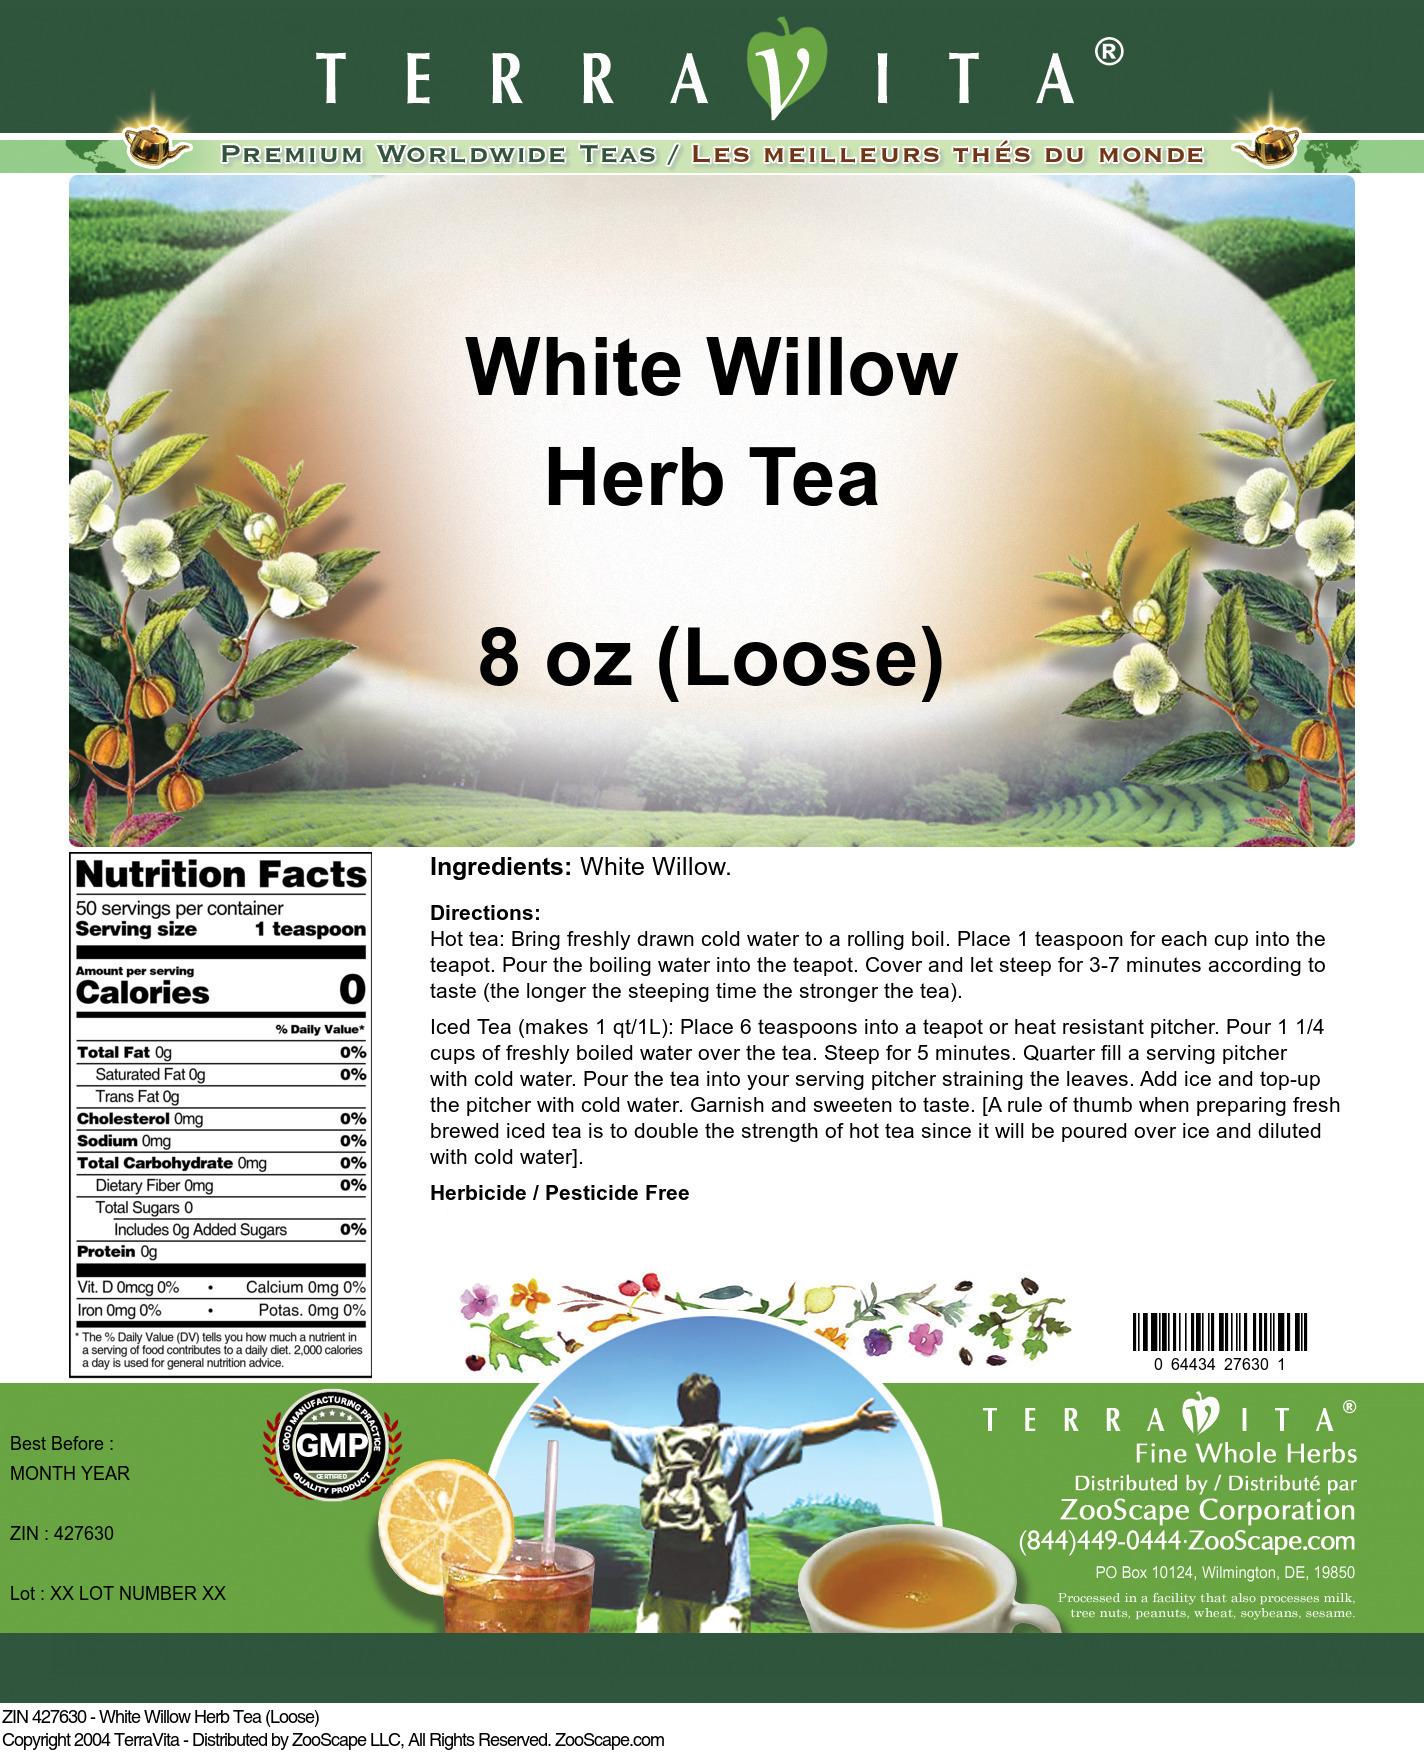 White Willow Herb Tea (Loose)